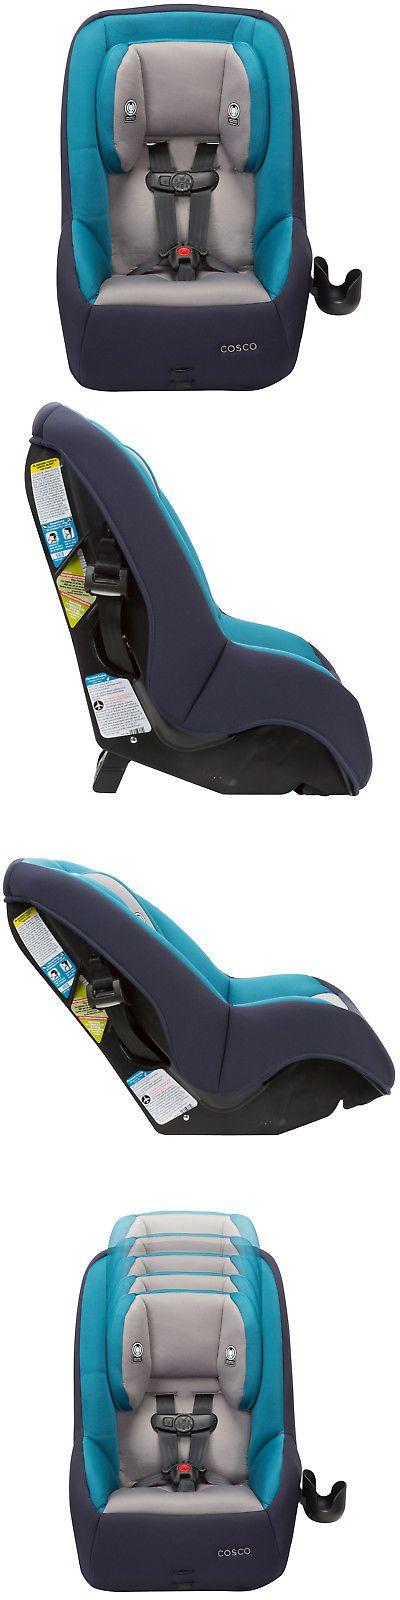 Convertible Car Seat 5 40lbs 66695 Cosco MightyfitTM 65